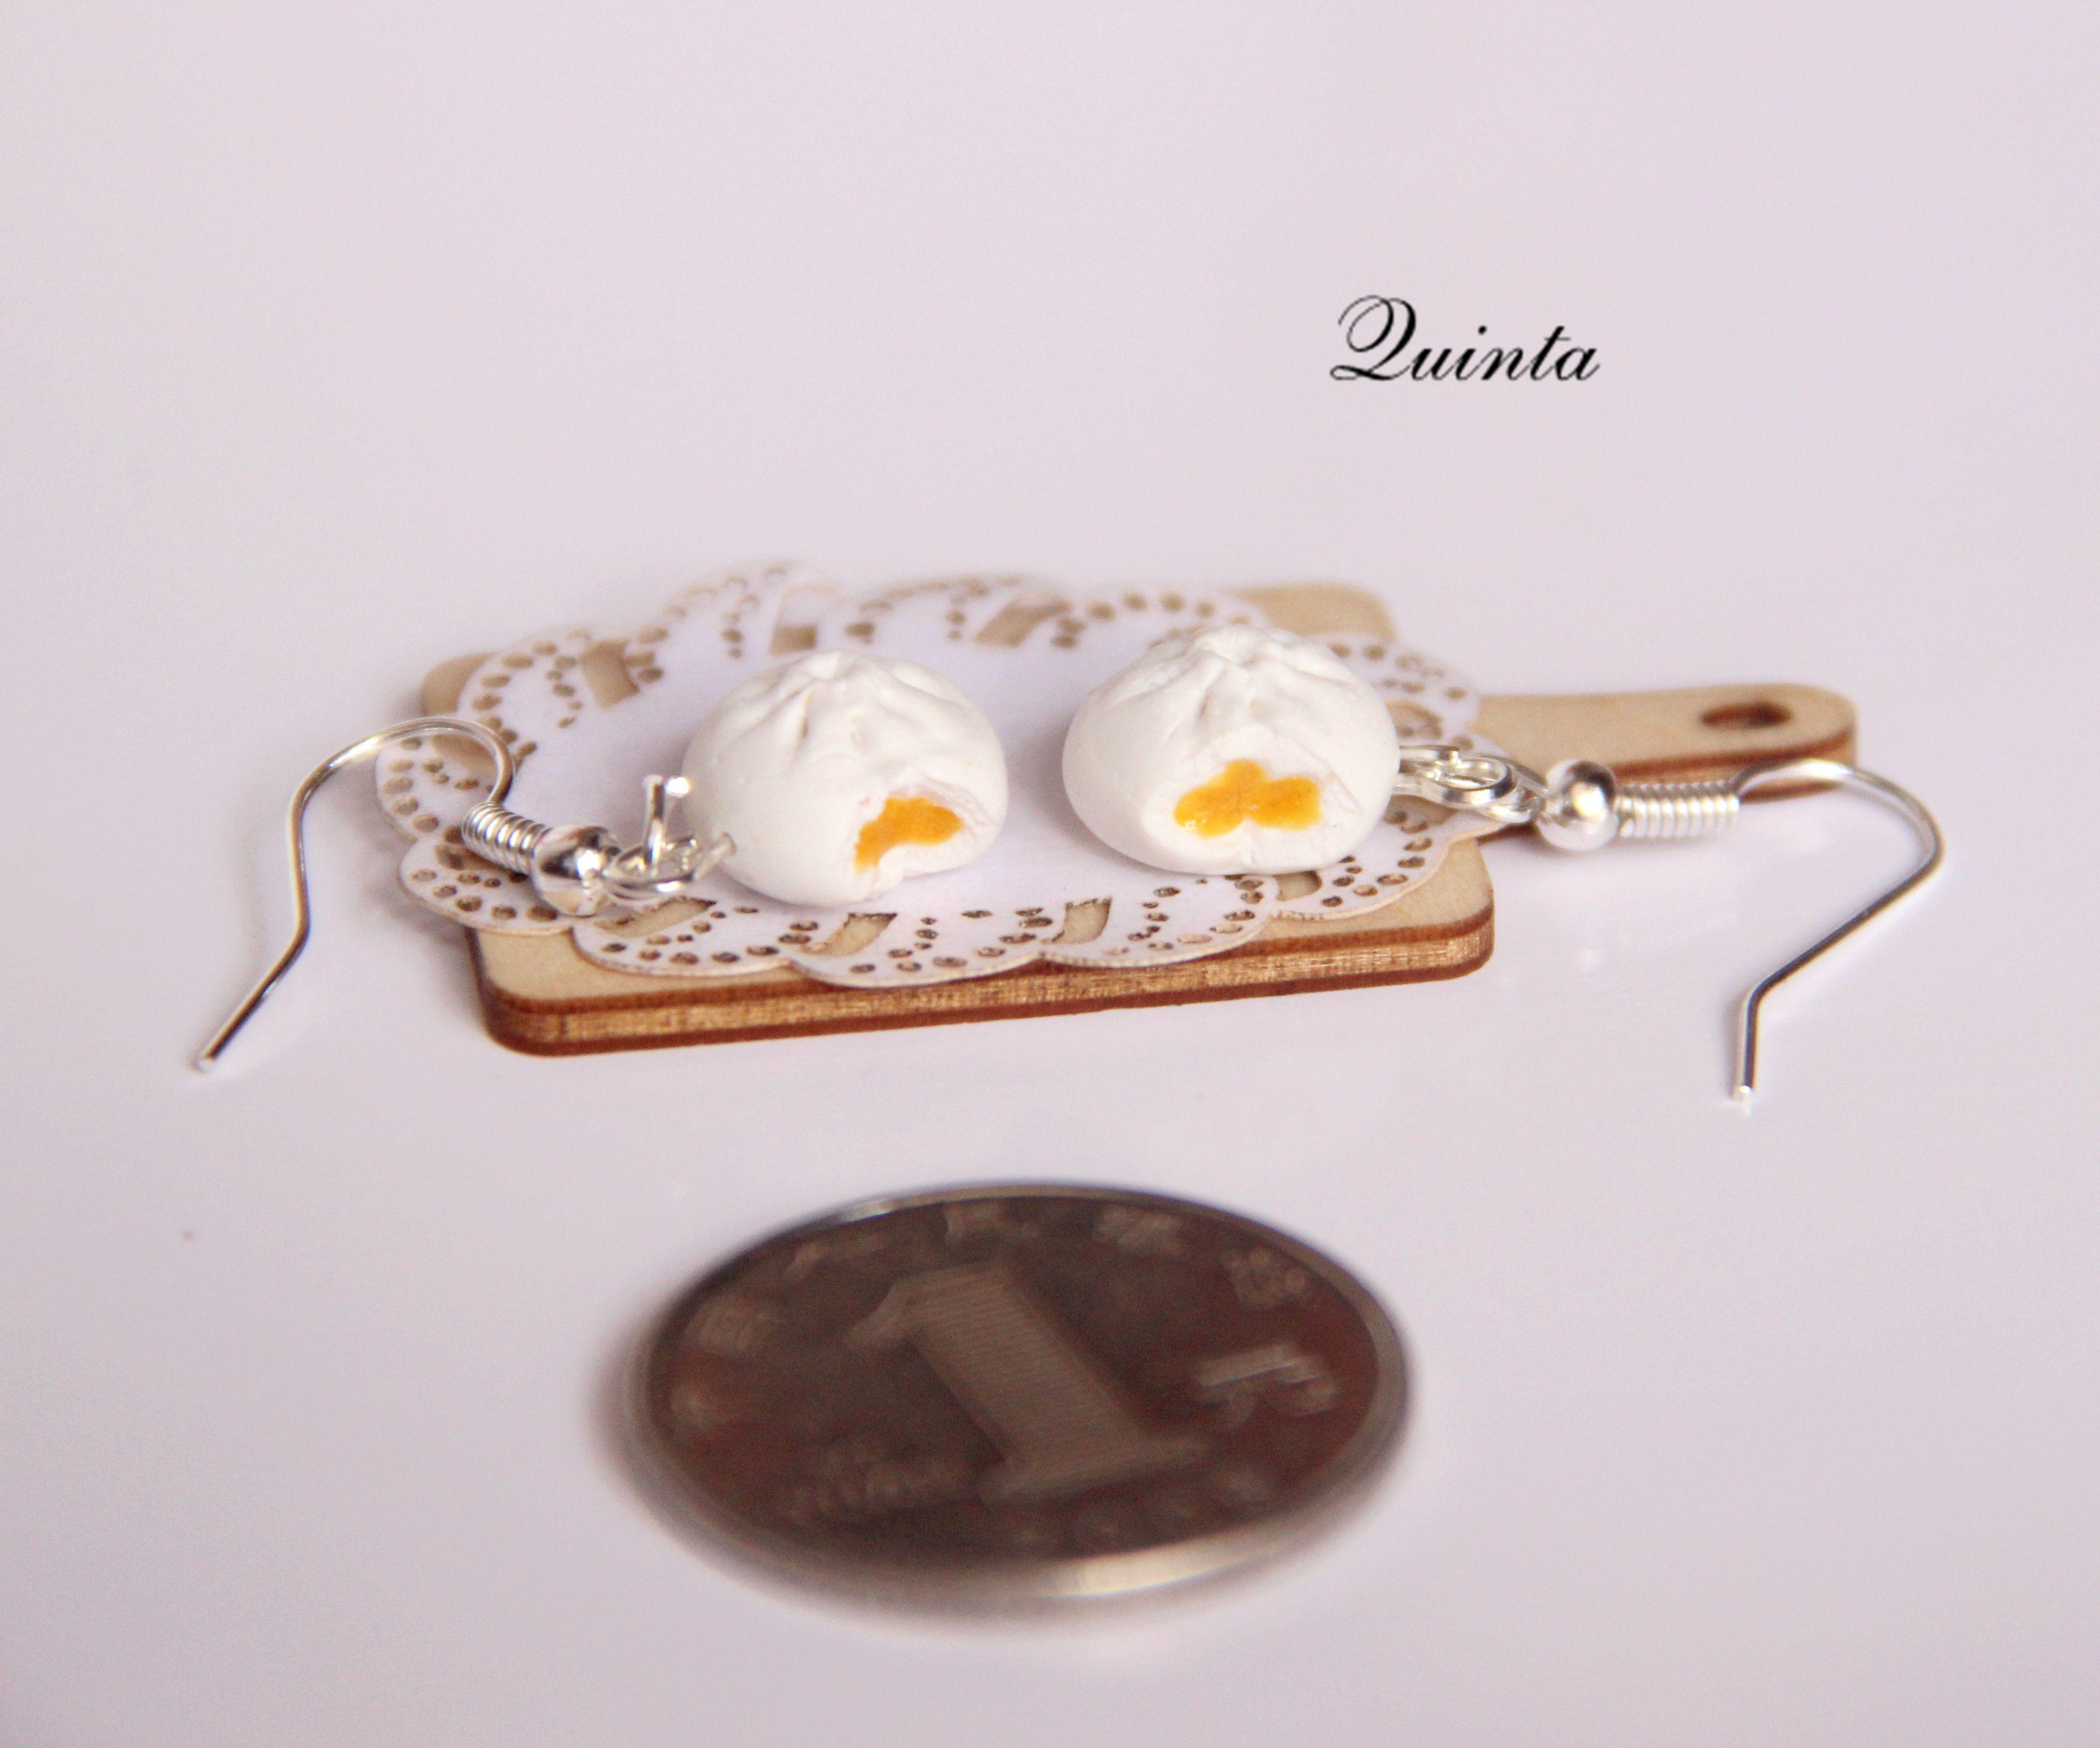 Quinta原创手作叉烧包金沙包耳环耳钉925银饰仿真食物饰品